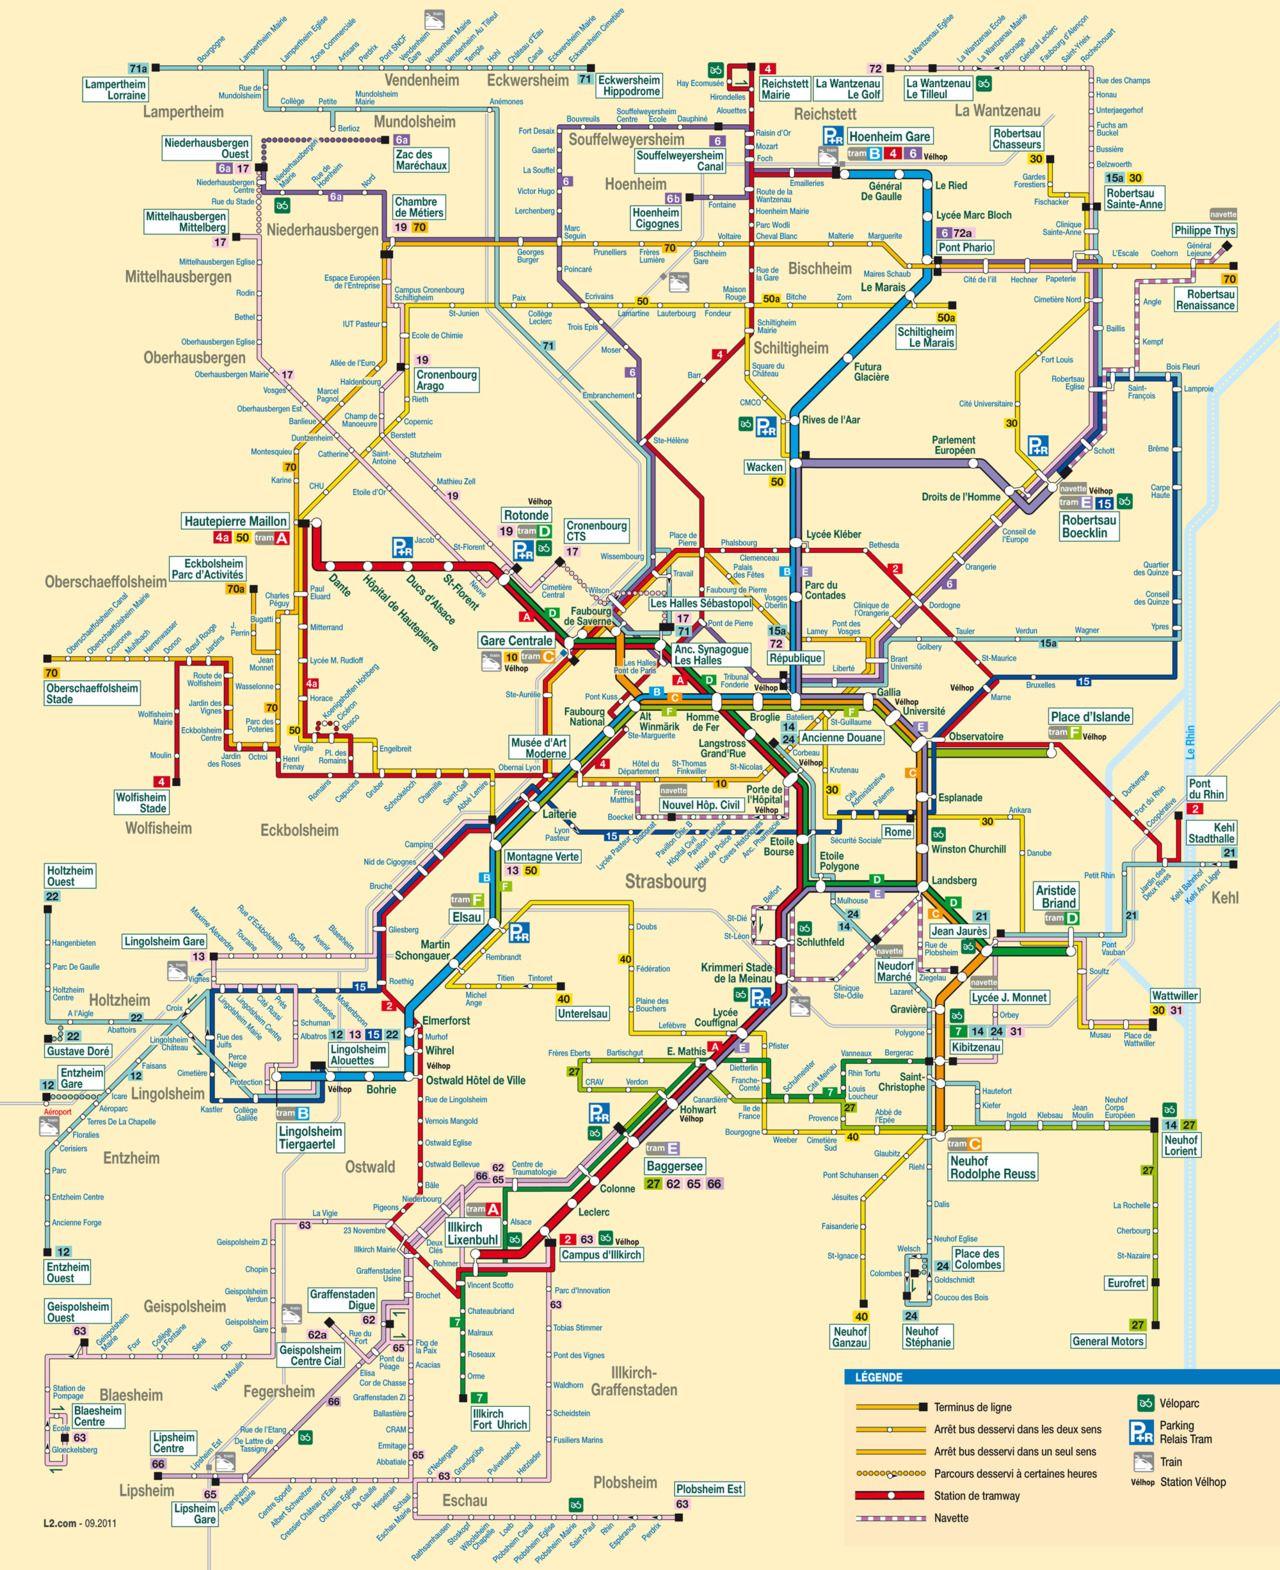 official map bus and tram network map strasbourg france. Black Bedroom Furniture Sets. Home Design Ideas